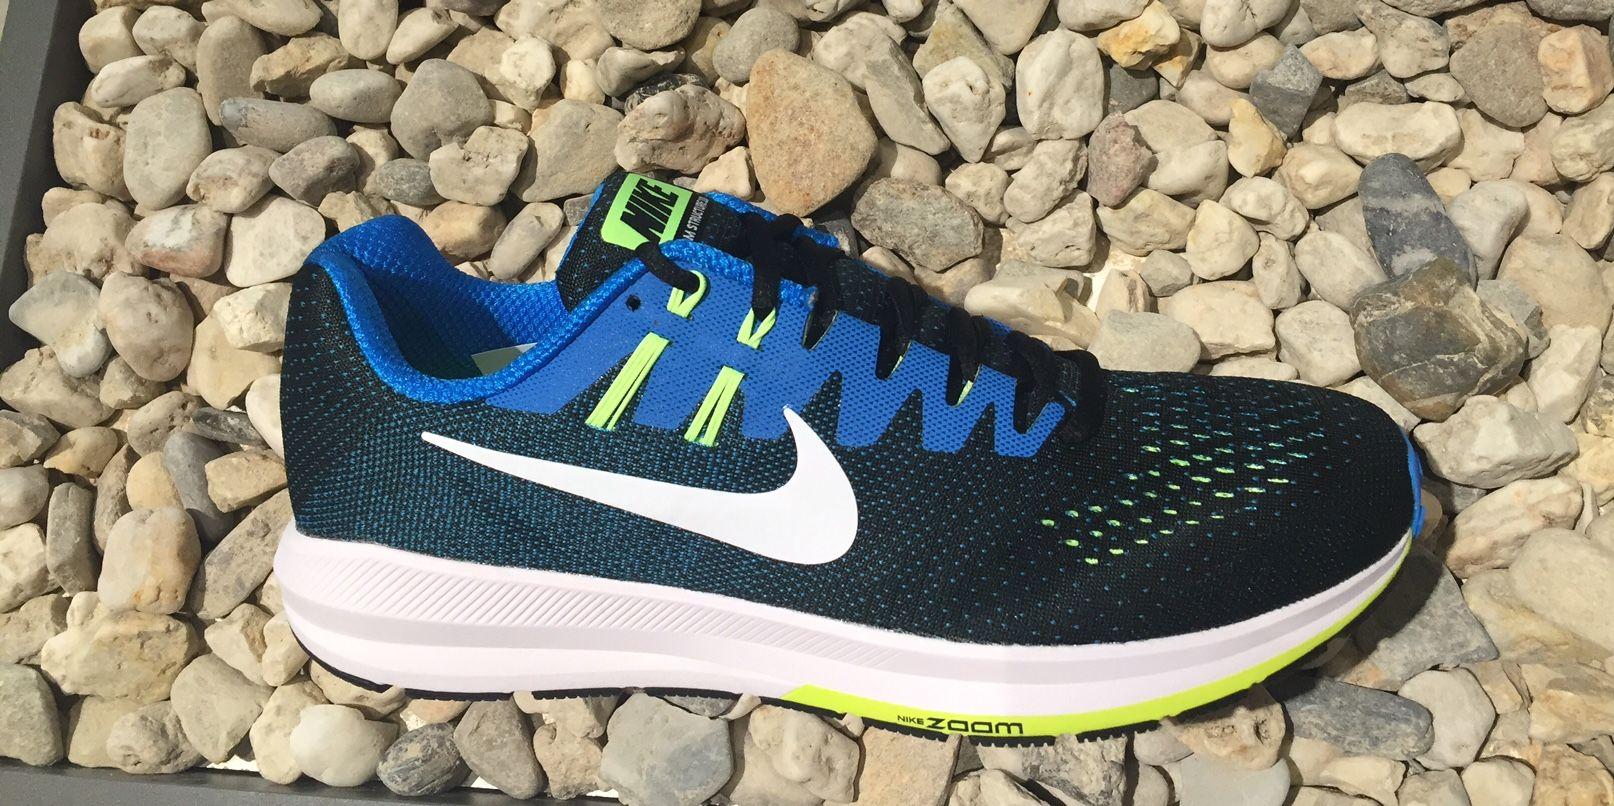 Nike Air Zoom Structure 20 in Blau